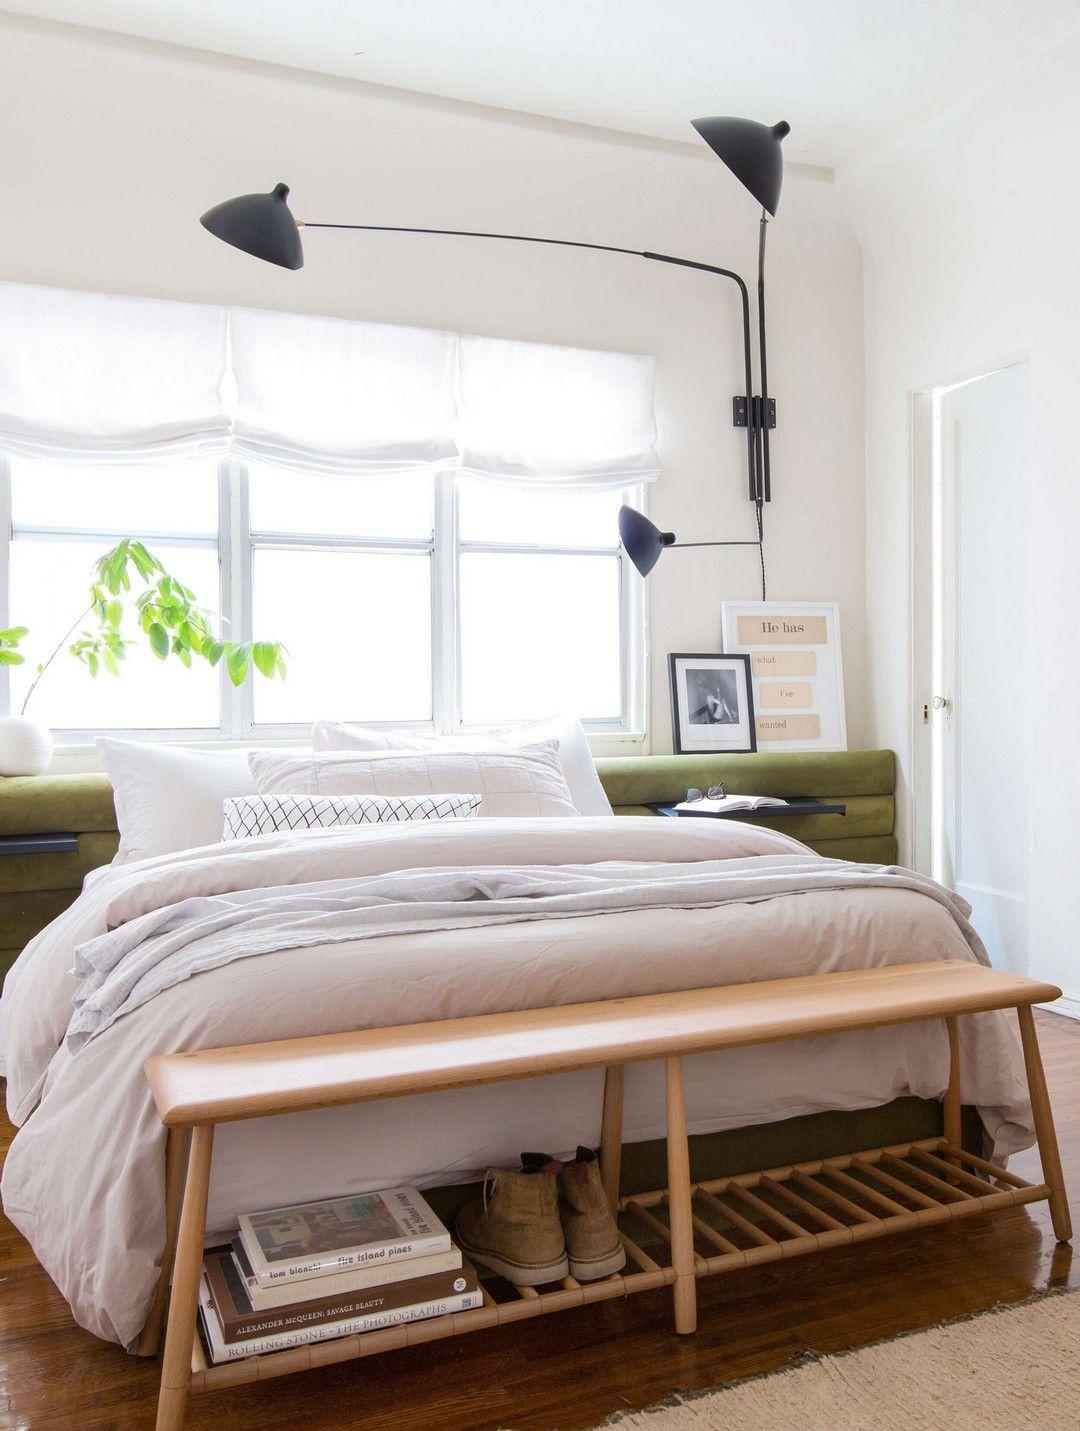 Aesthetic Master Bedroom With Lighting Fixture Ideas Luxurious Bedrooms Home Decor Bedroom Design Your Own Bedroom